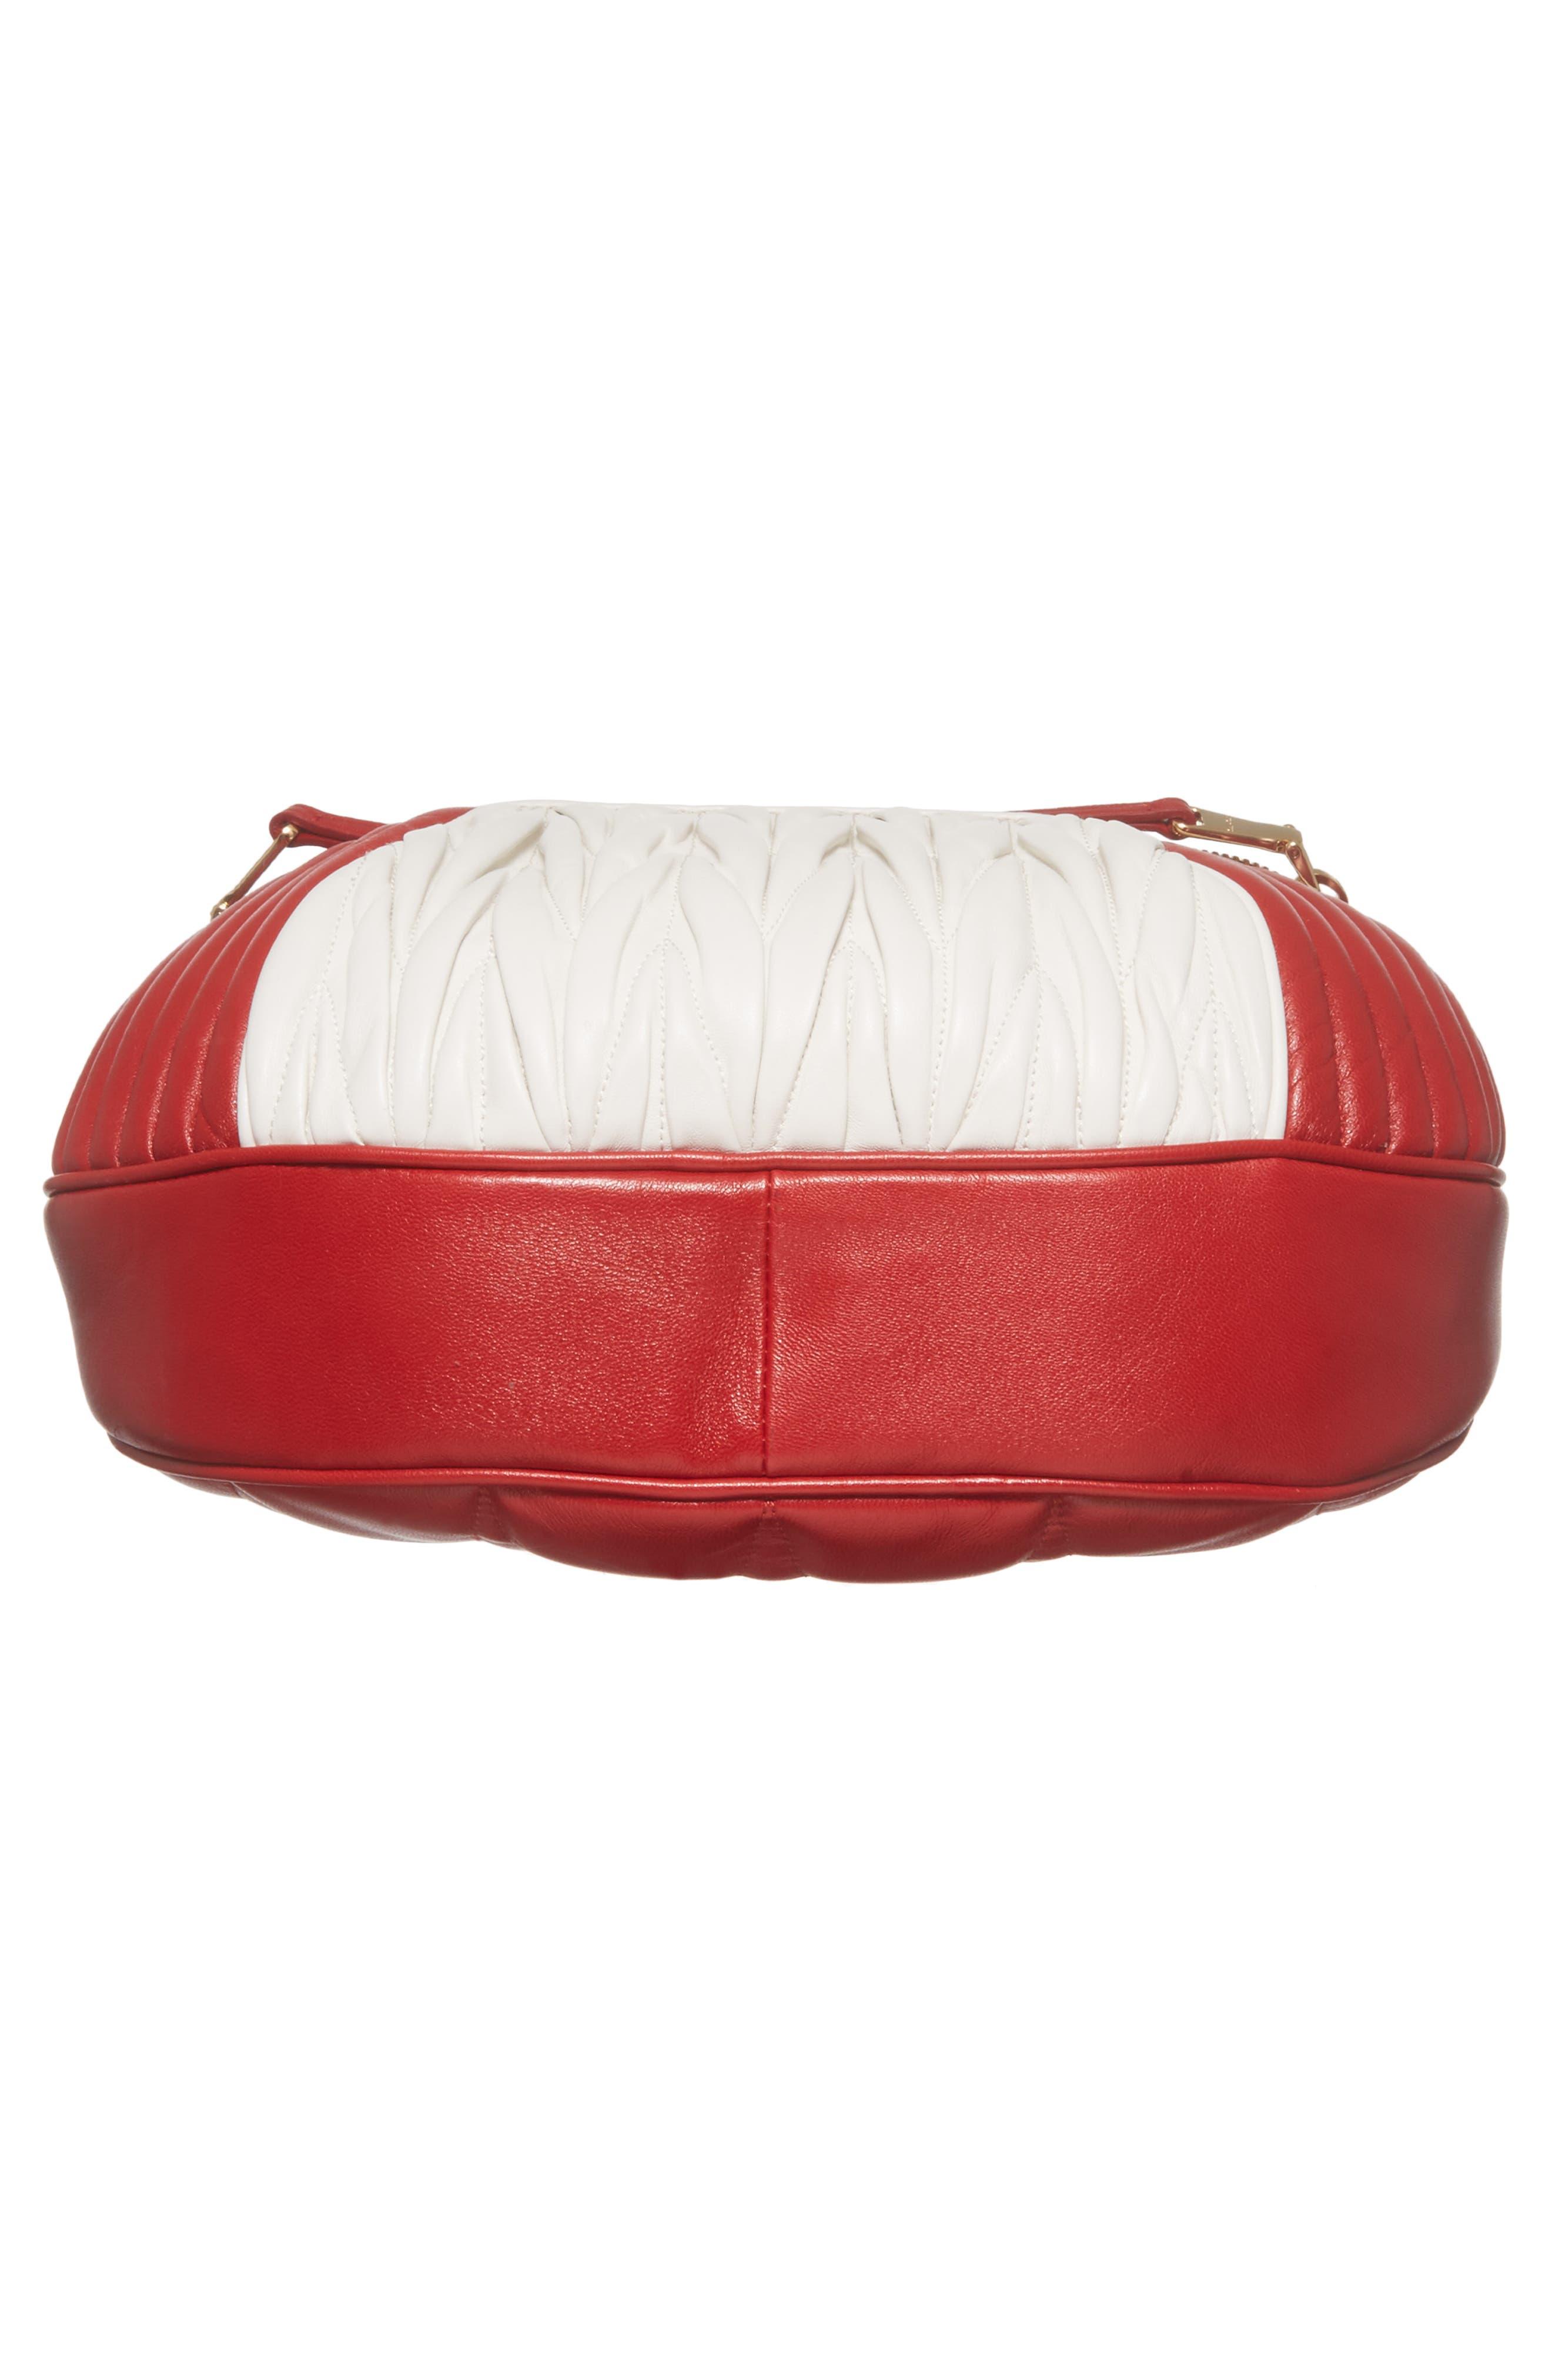 Small Rider Matelassé Leather Shoulder Bag,                             Alternate thumbnail 7, color,                             Fuoco/ Bianco